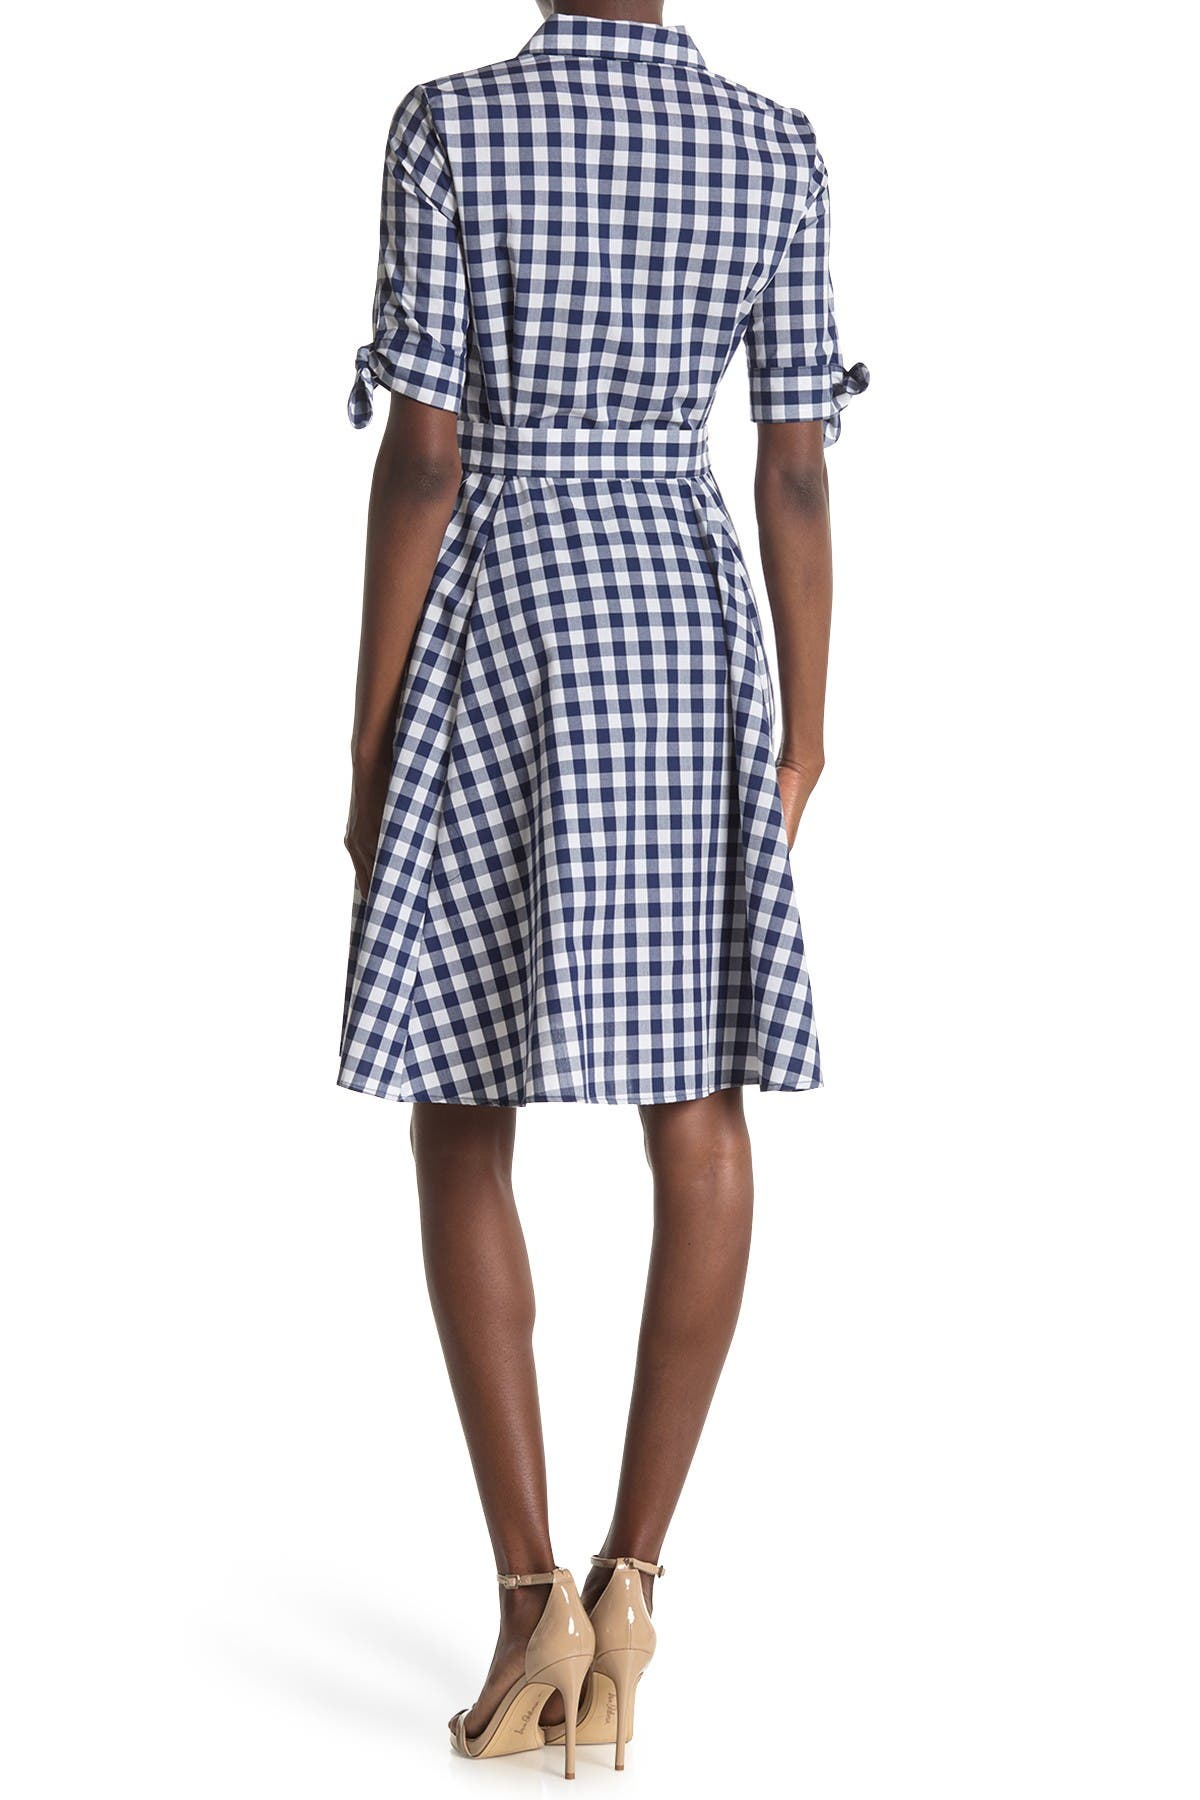 Image of Calvin Klein Short Sleeve Checkered Print Dress